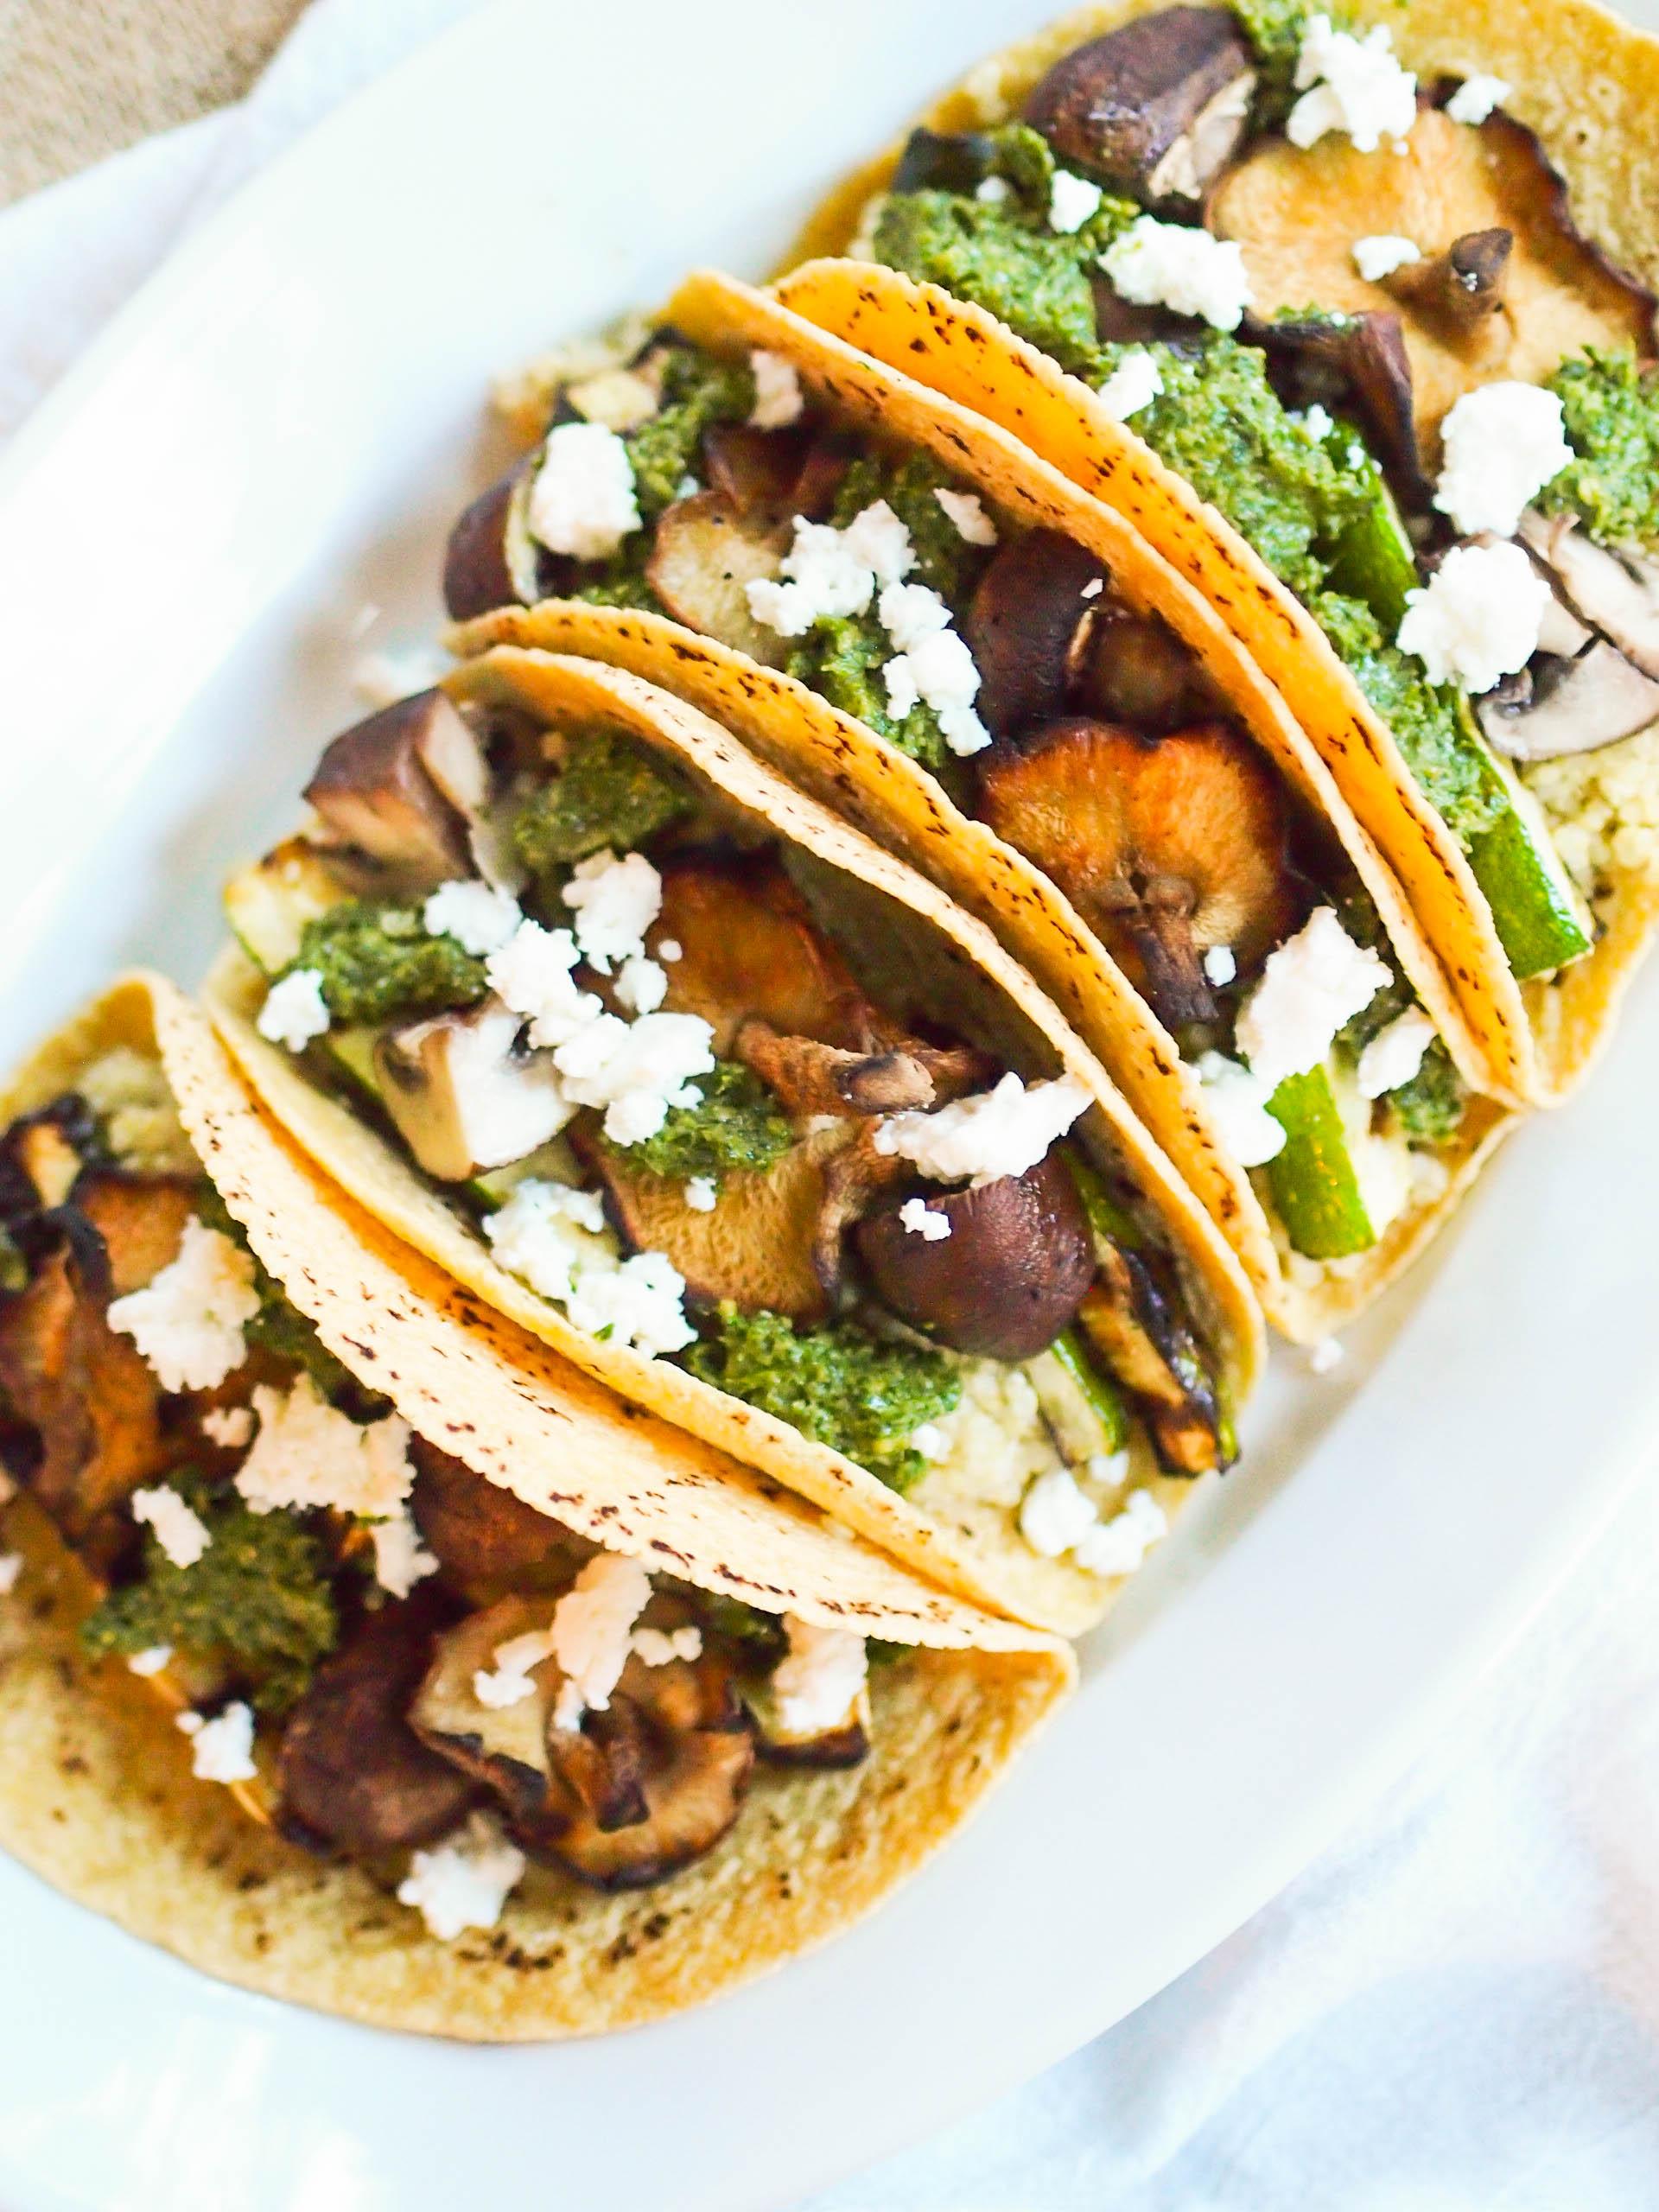 Vegetarian Grilled Vegetable and Quinoa Tacos with Cilantro Pesto